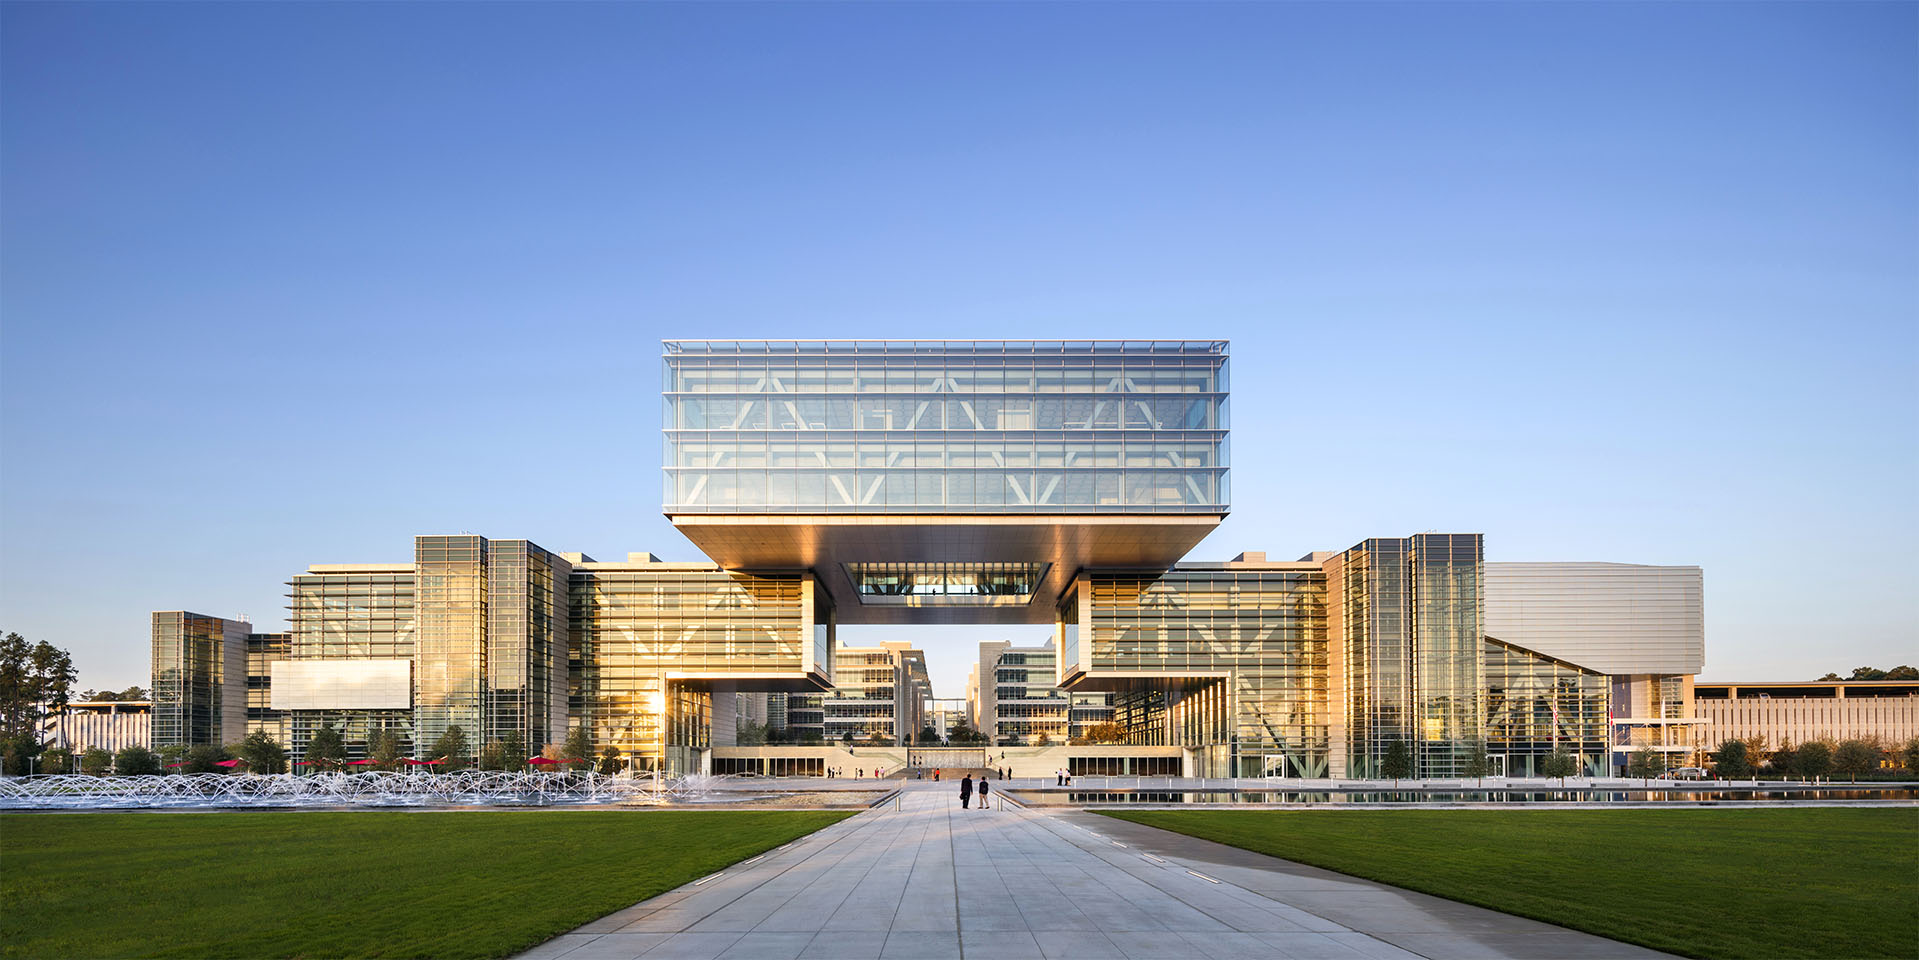 The two multi-story design of the ExxonMobil Energy Center in Houston, Texas